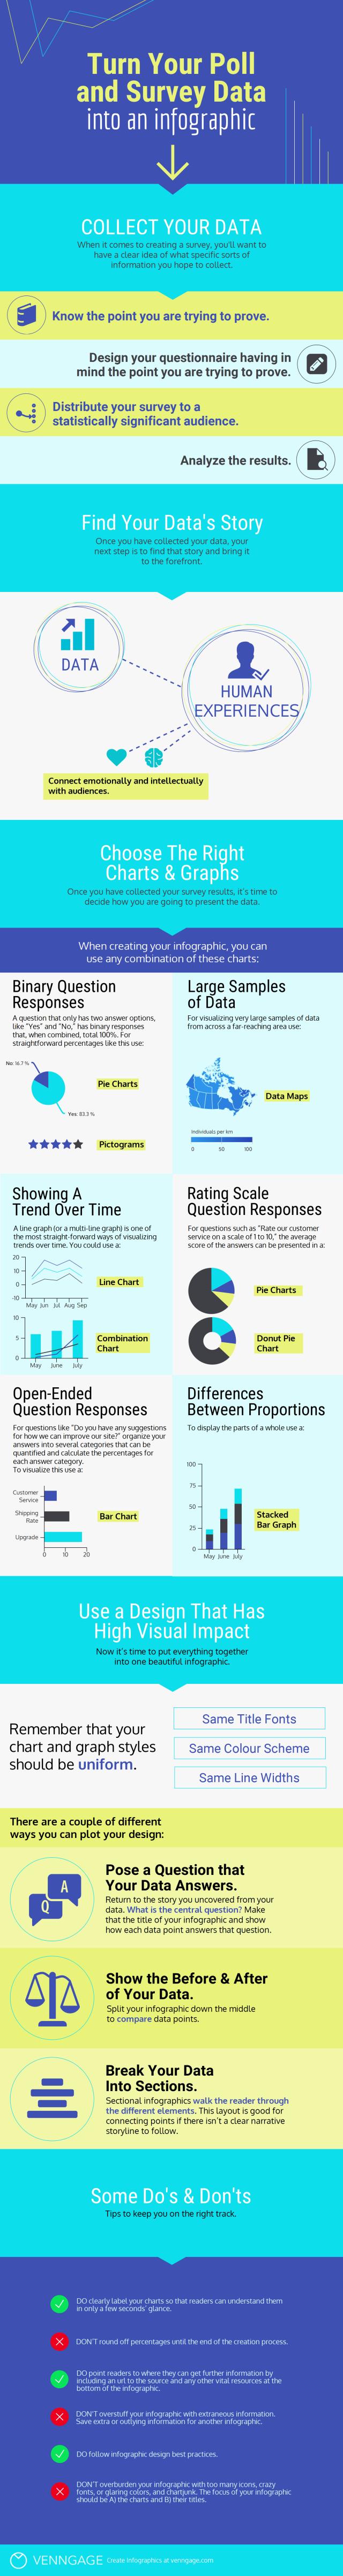 PollFish Infographic